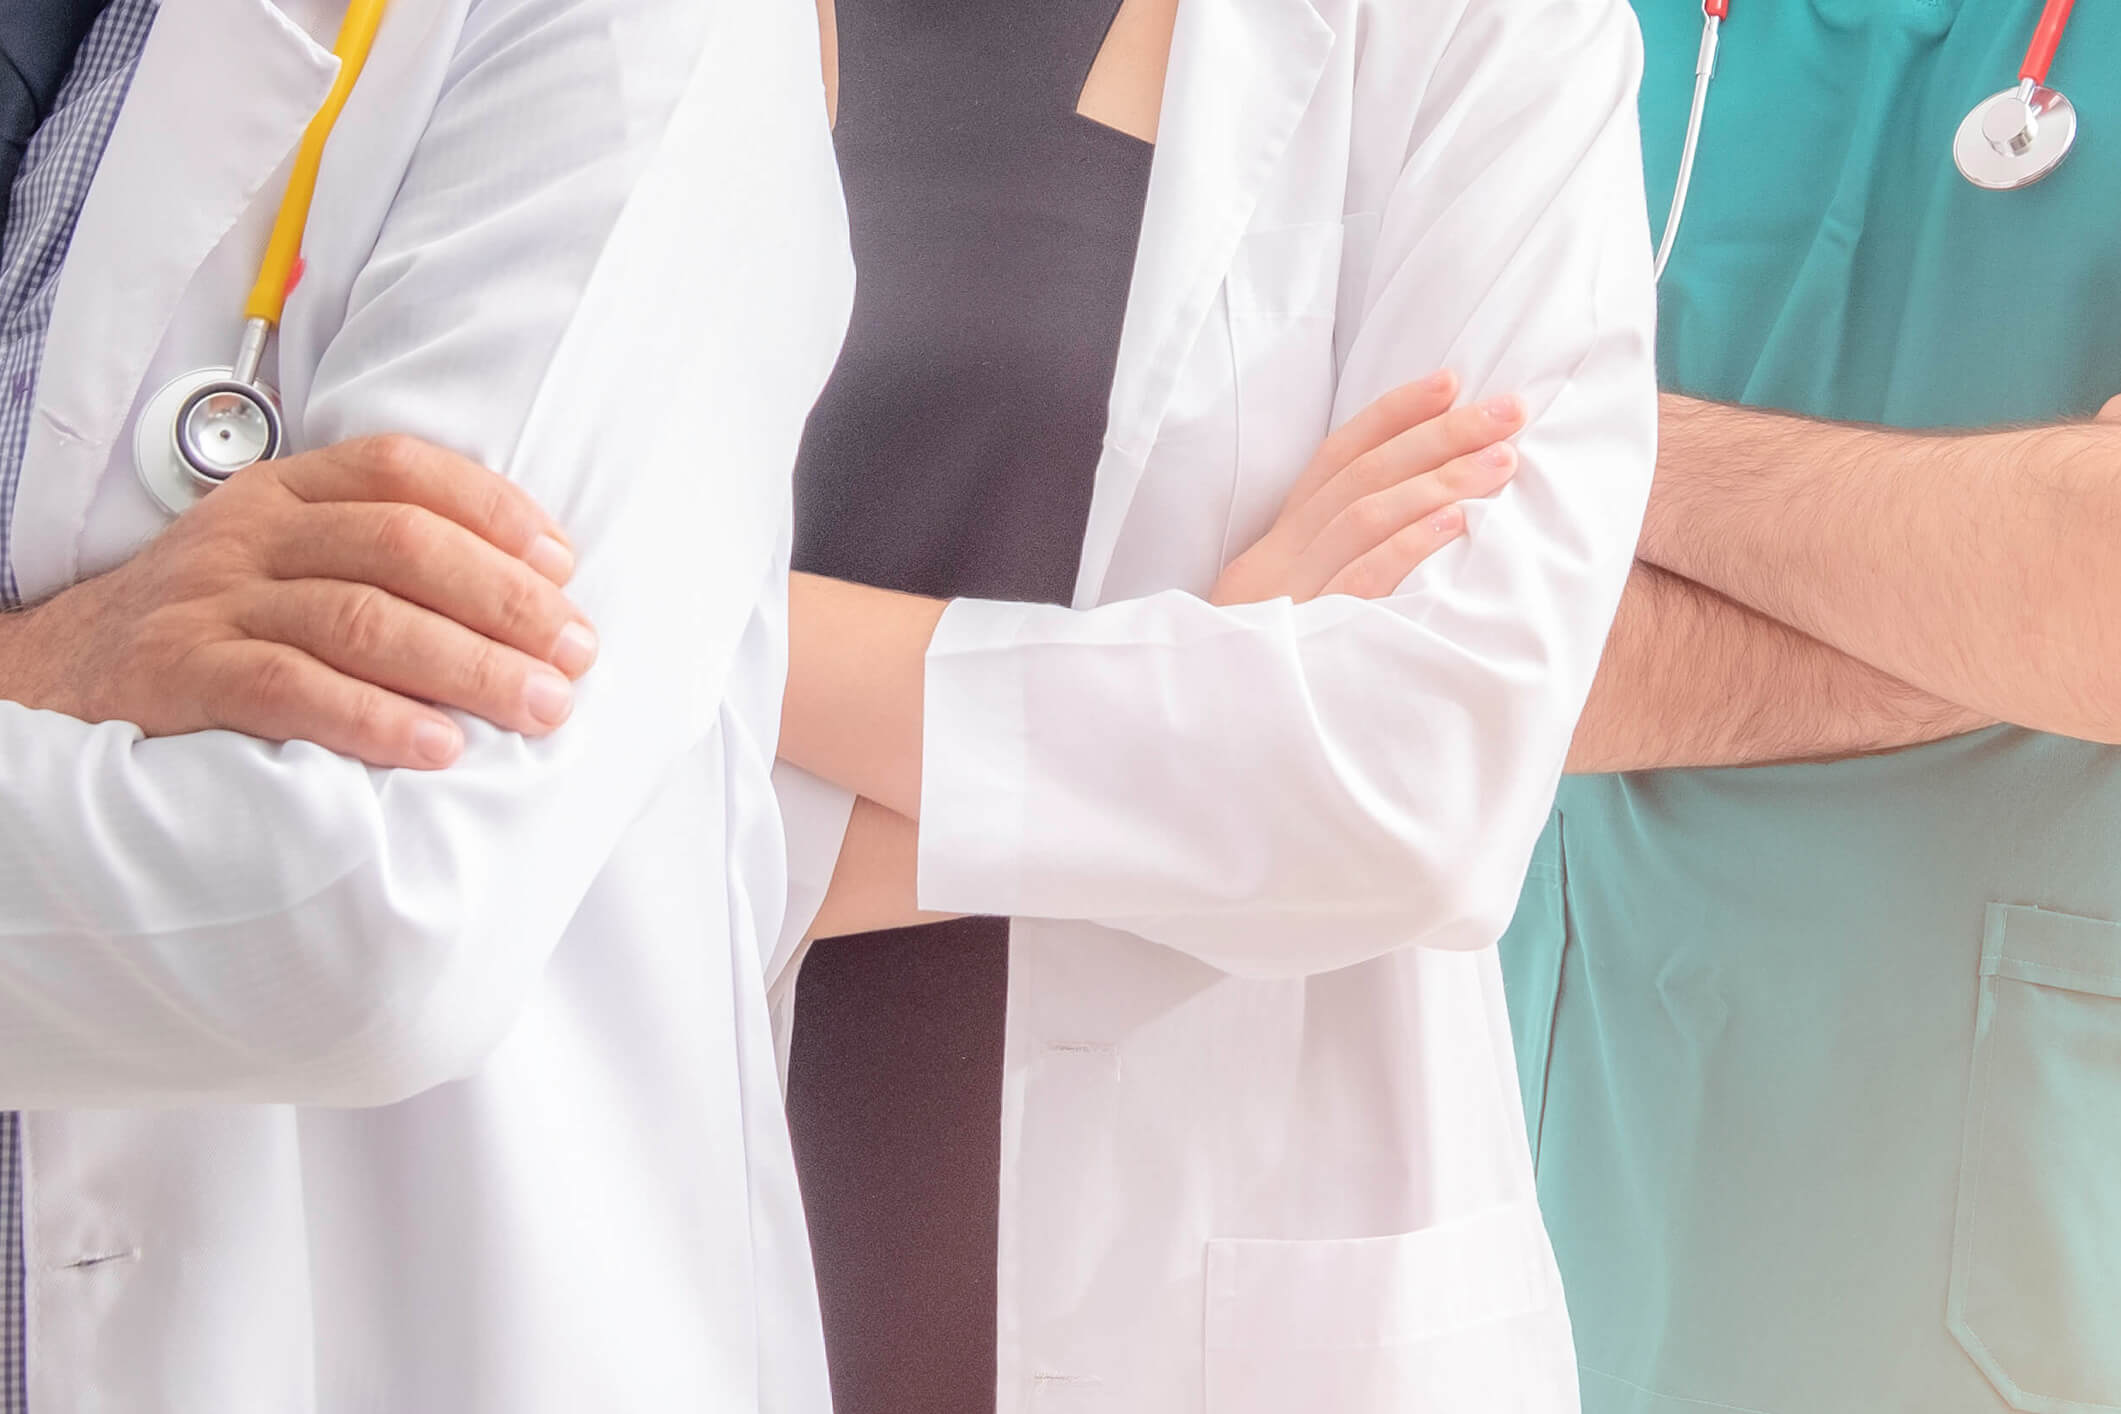 Dr. Greg Gardner - Urgent Care - Walk-In Clinic in North Richland Hills, TX - EMC Express Care